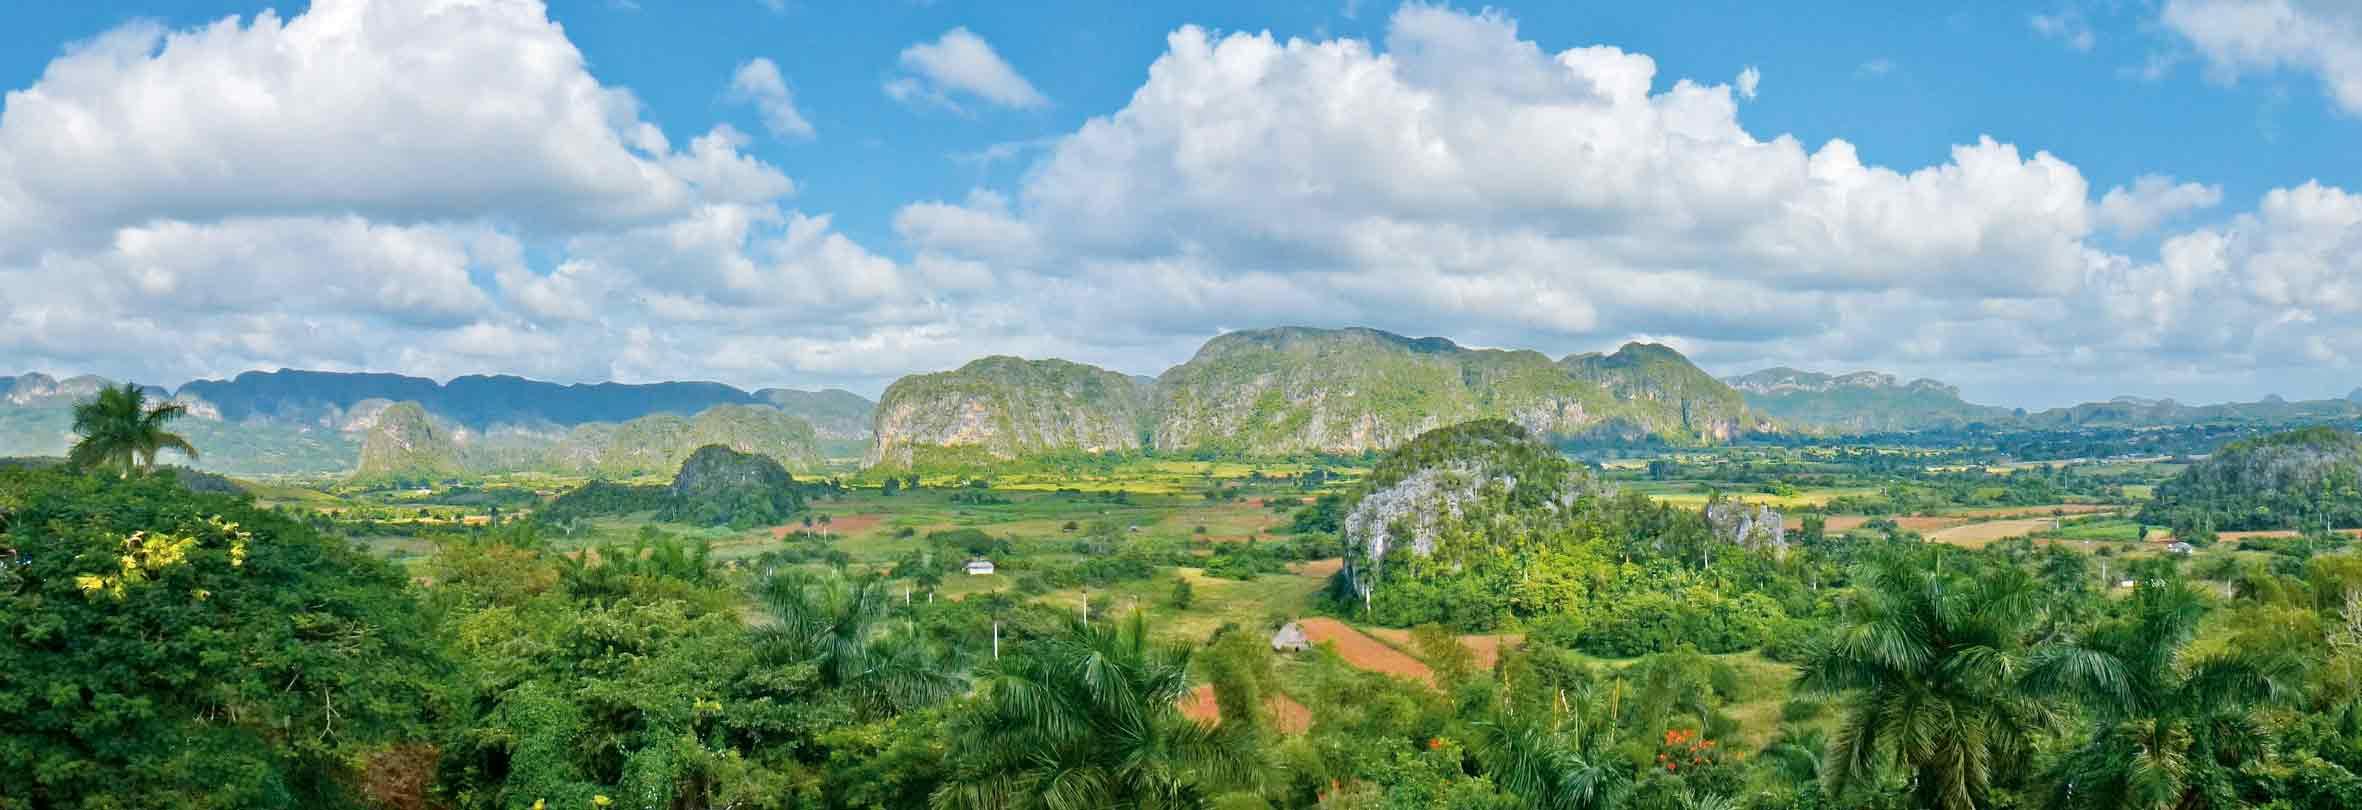 Ausblick auf die Mogotes im Viñales-Tal, Kuba